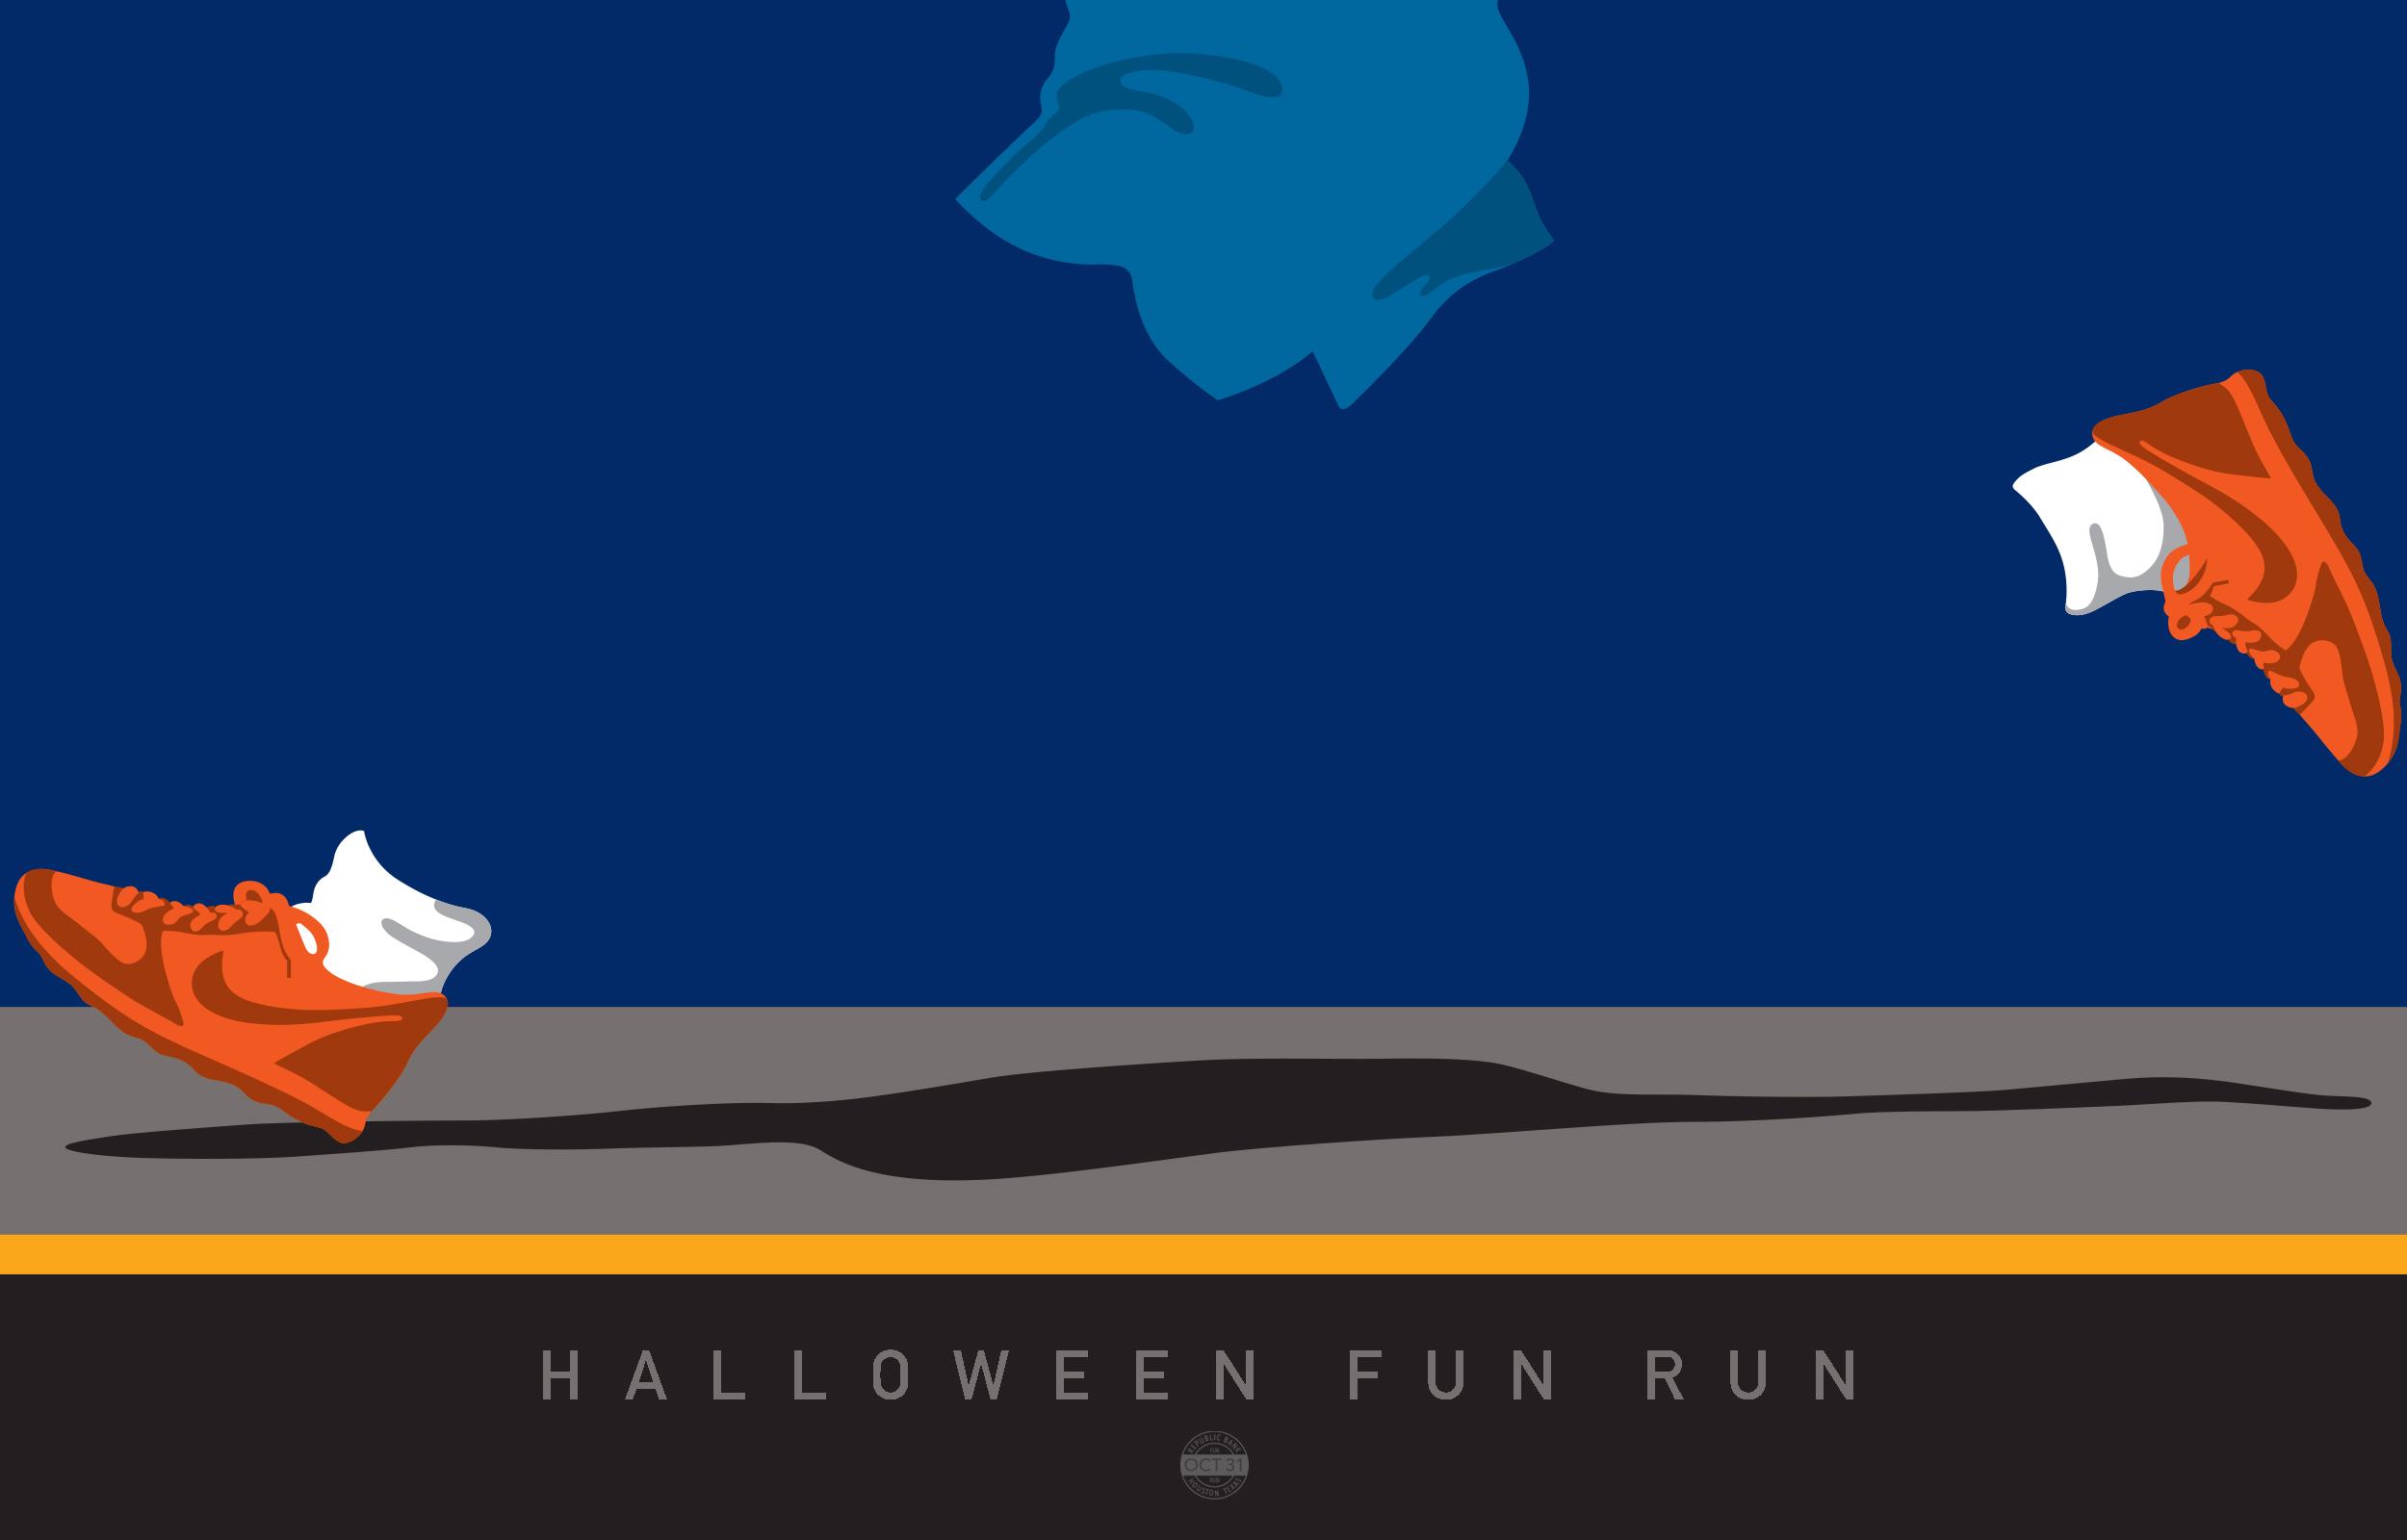 S01_10_Halloween_Fun_Run.jpg